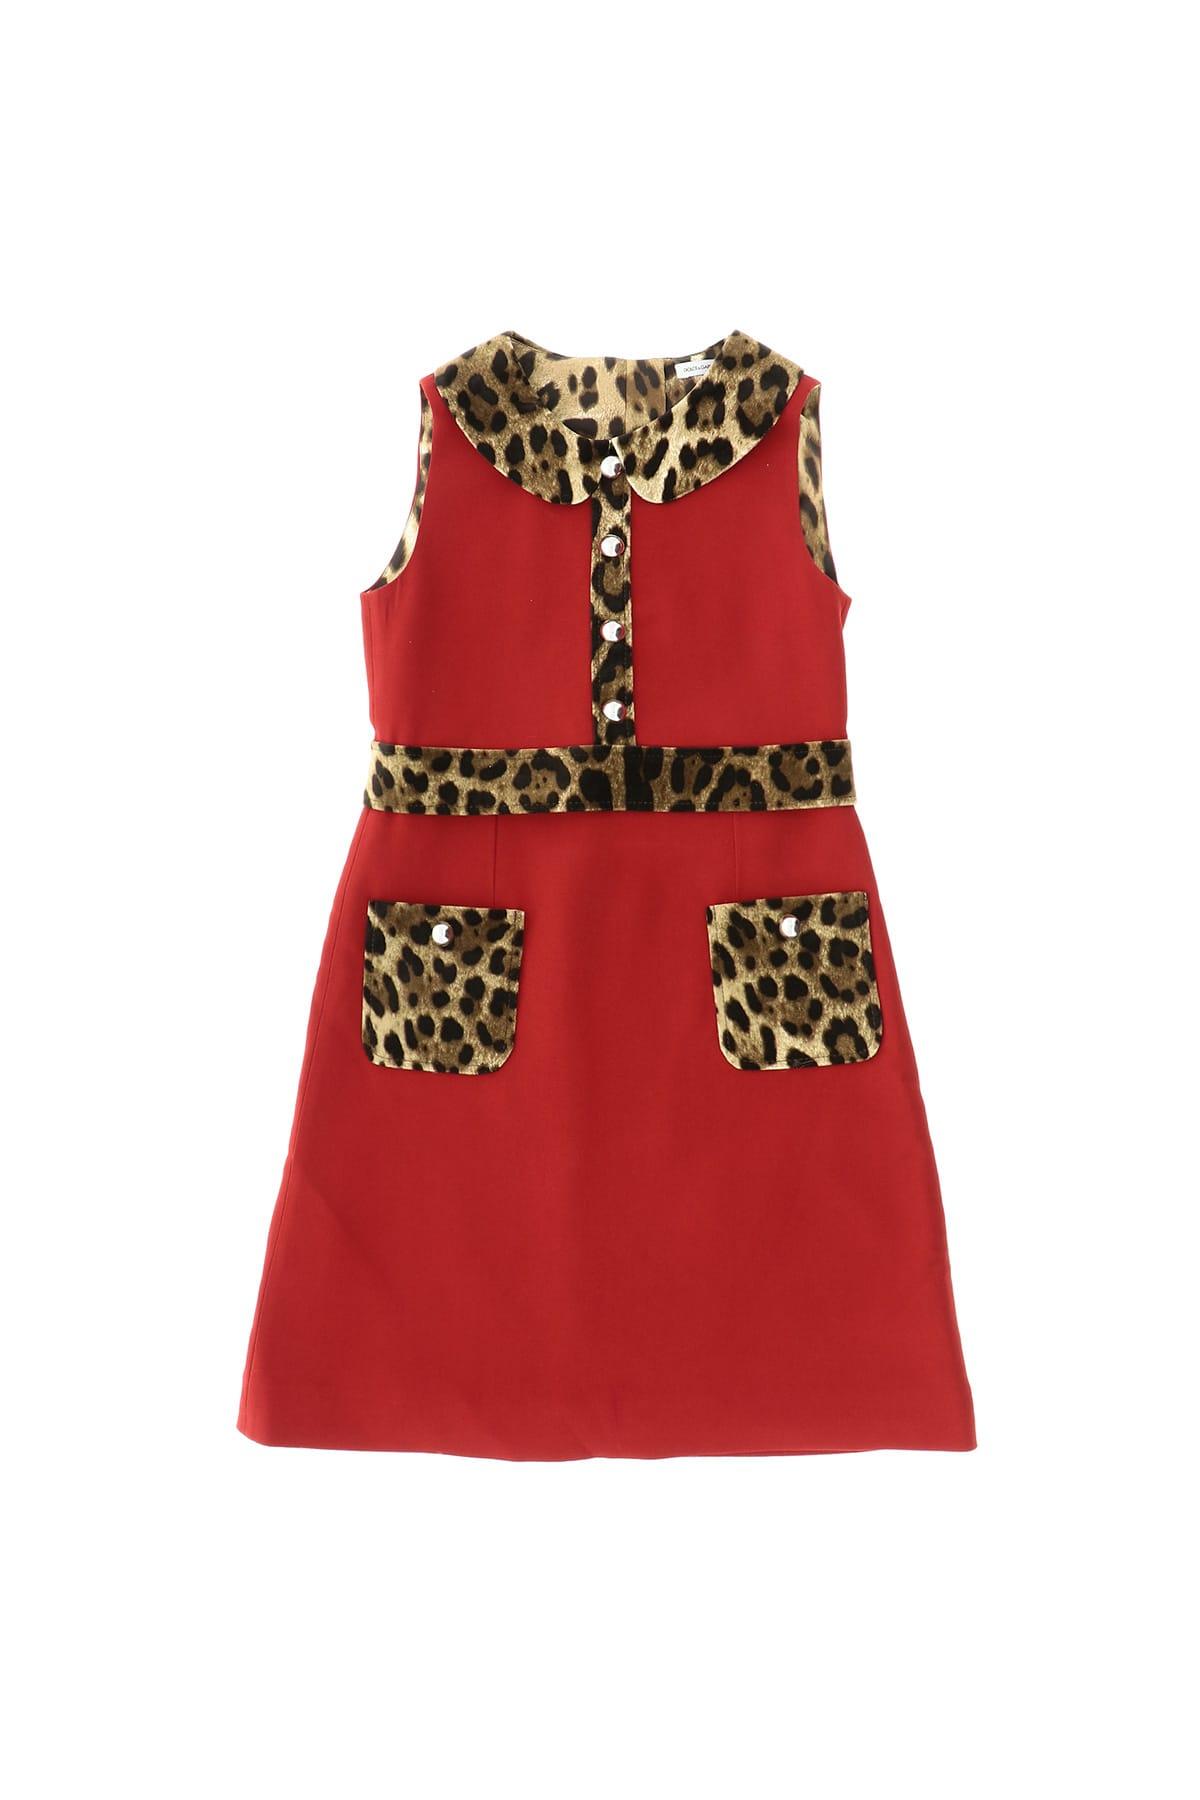 Buy Dolce & Gabbana Animalier Print Dress online, shop Dolce & Gabbana with free shipping